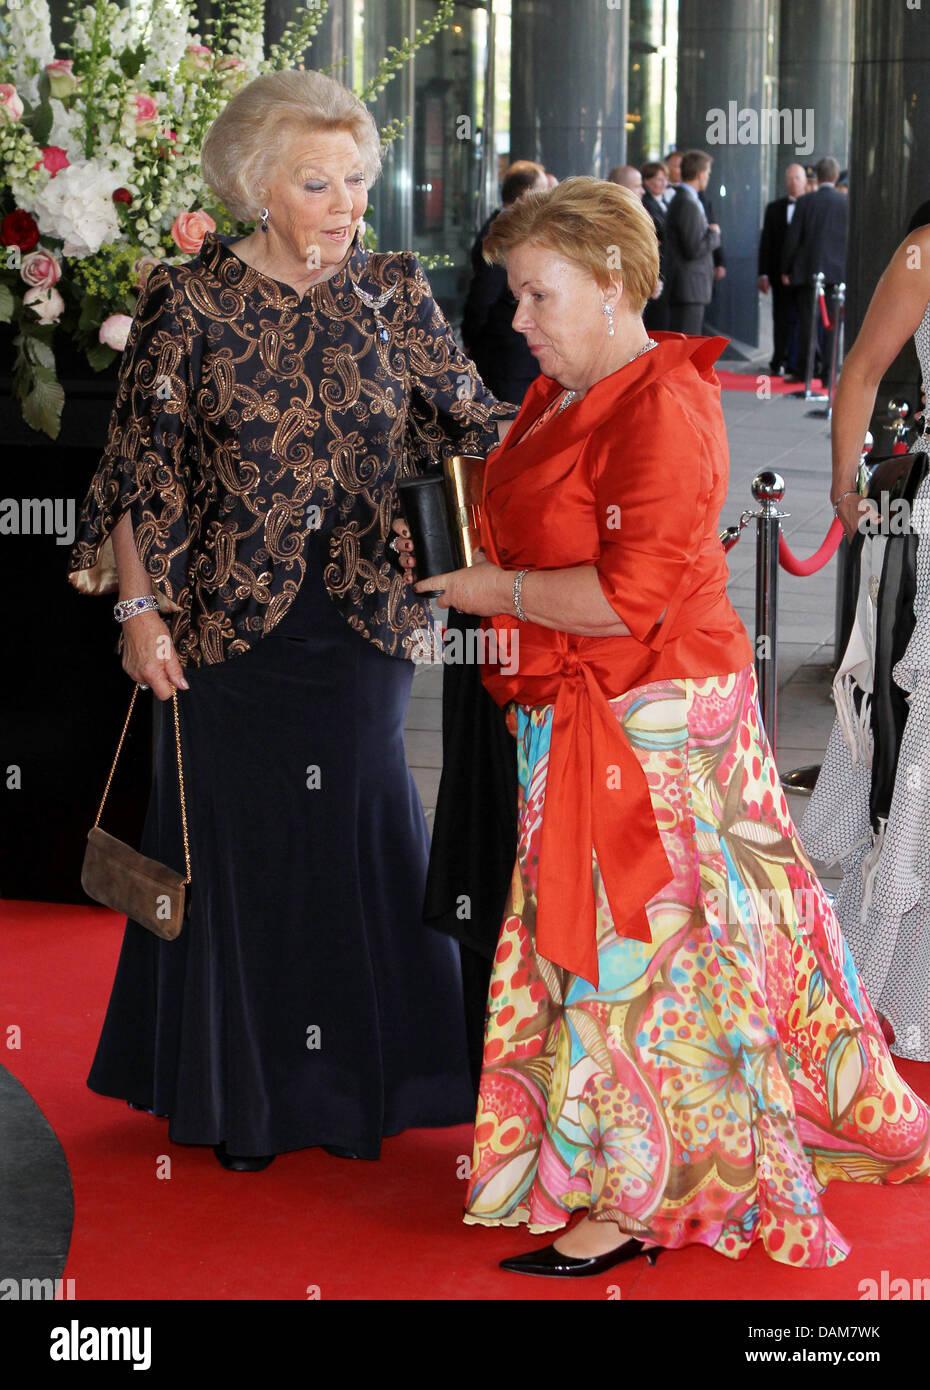 Princess Christina of the Netherlands